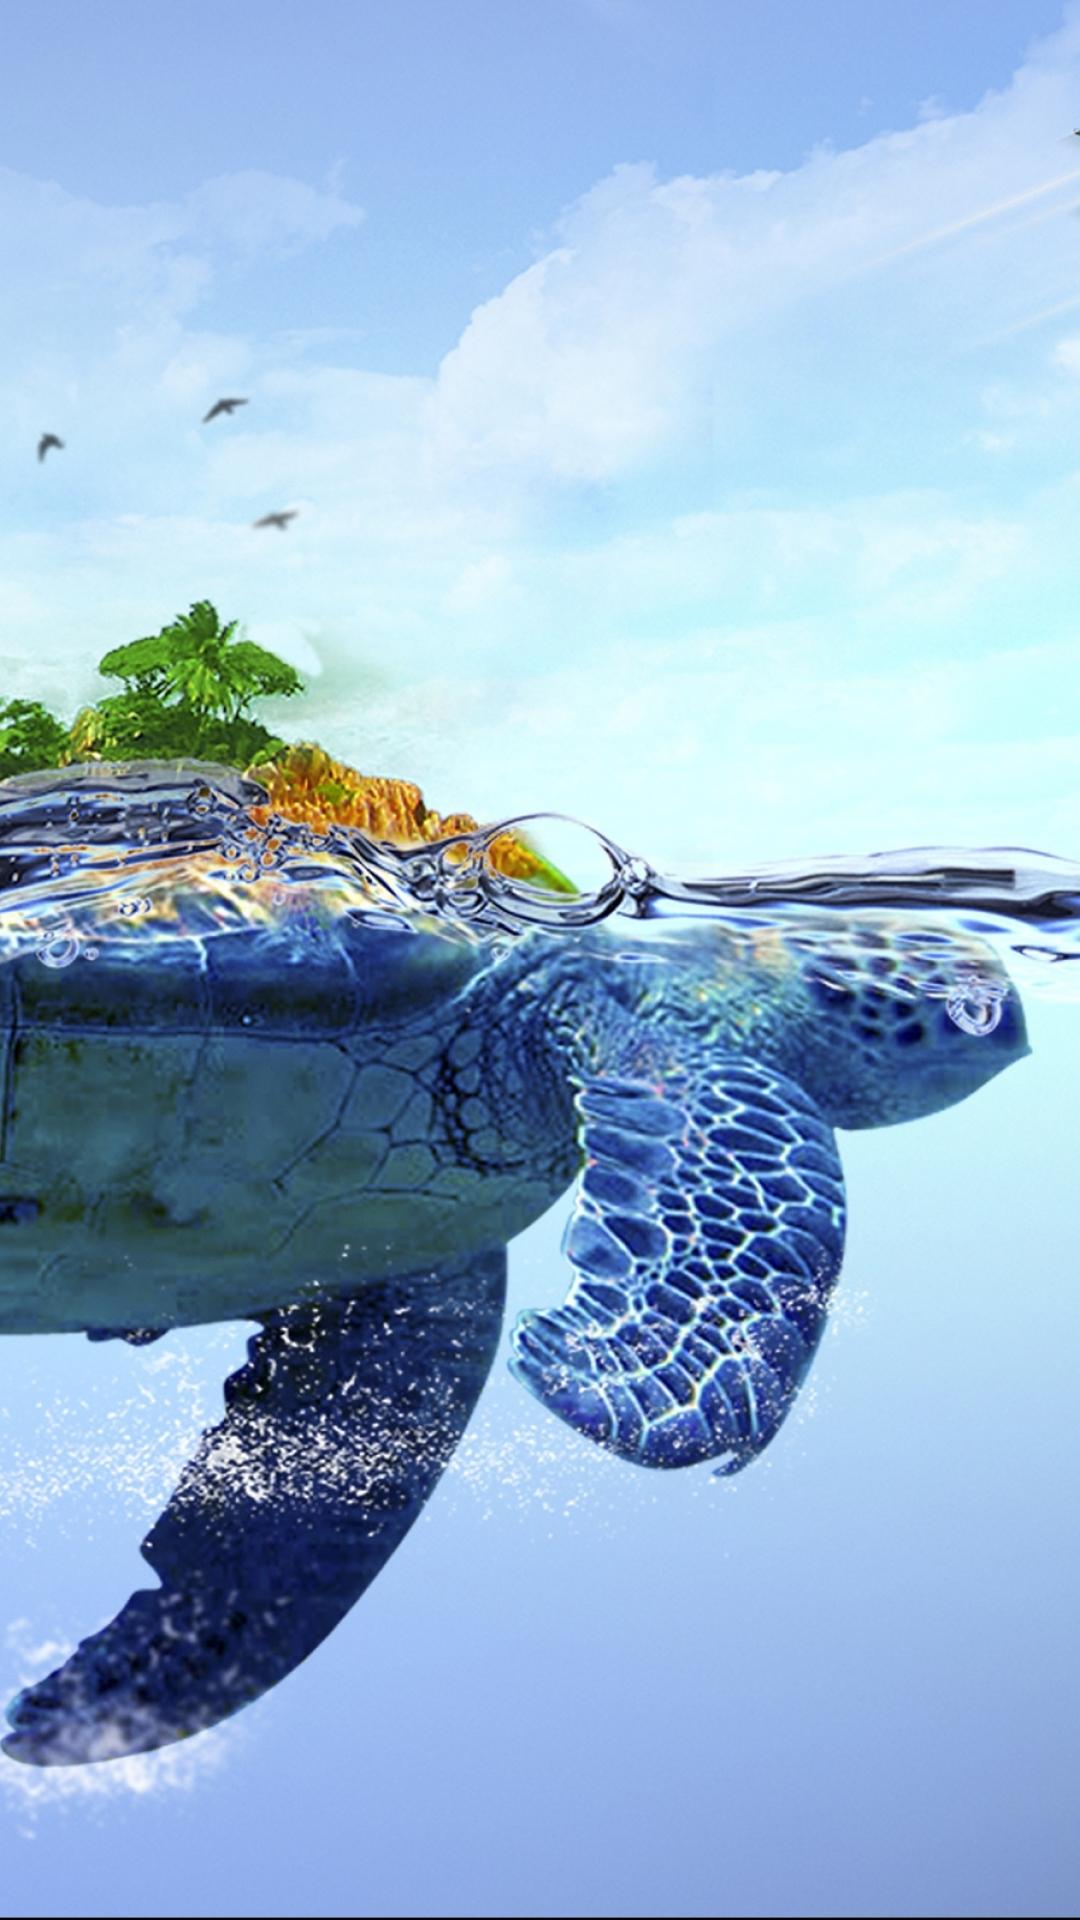 Iphone 7 Turtle Wallpaper Hd 1080x1920 Wallpaper Teahub Io